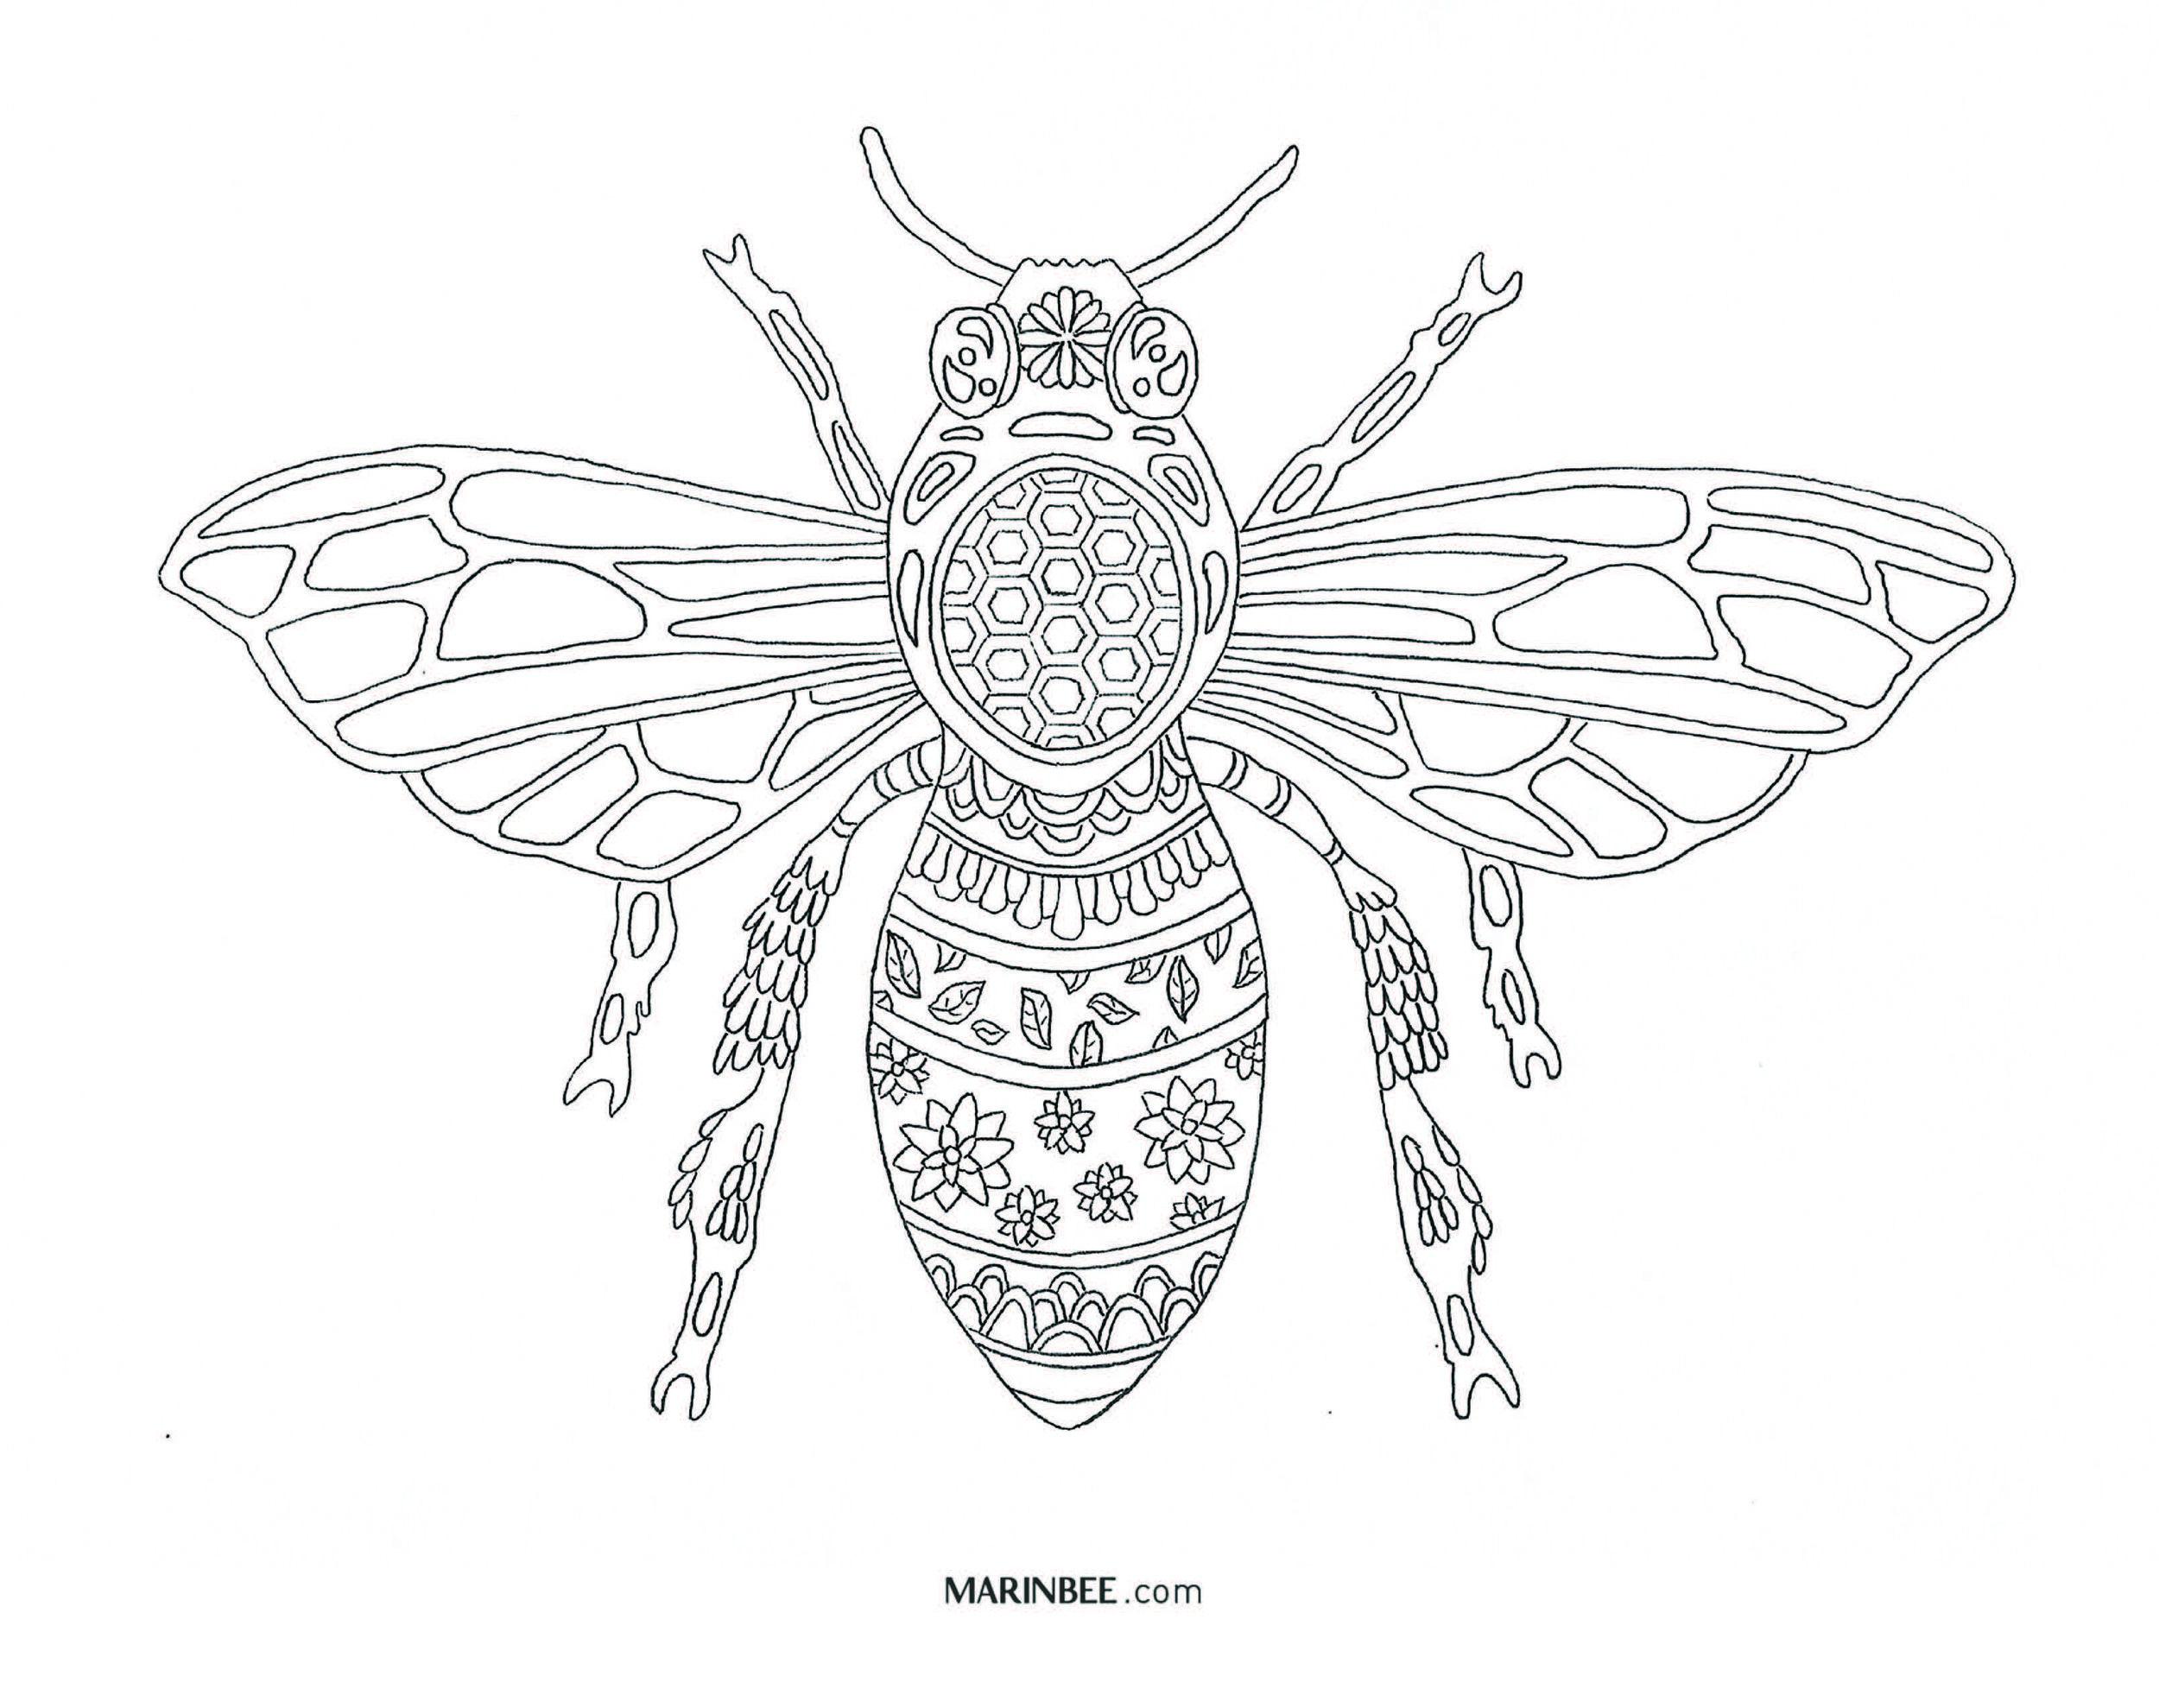 Marin Bee Color Me Bee-utiful